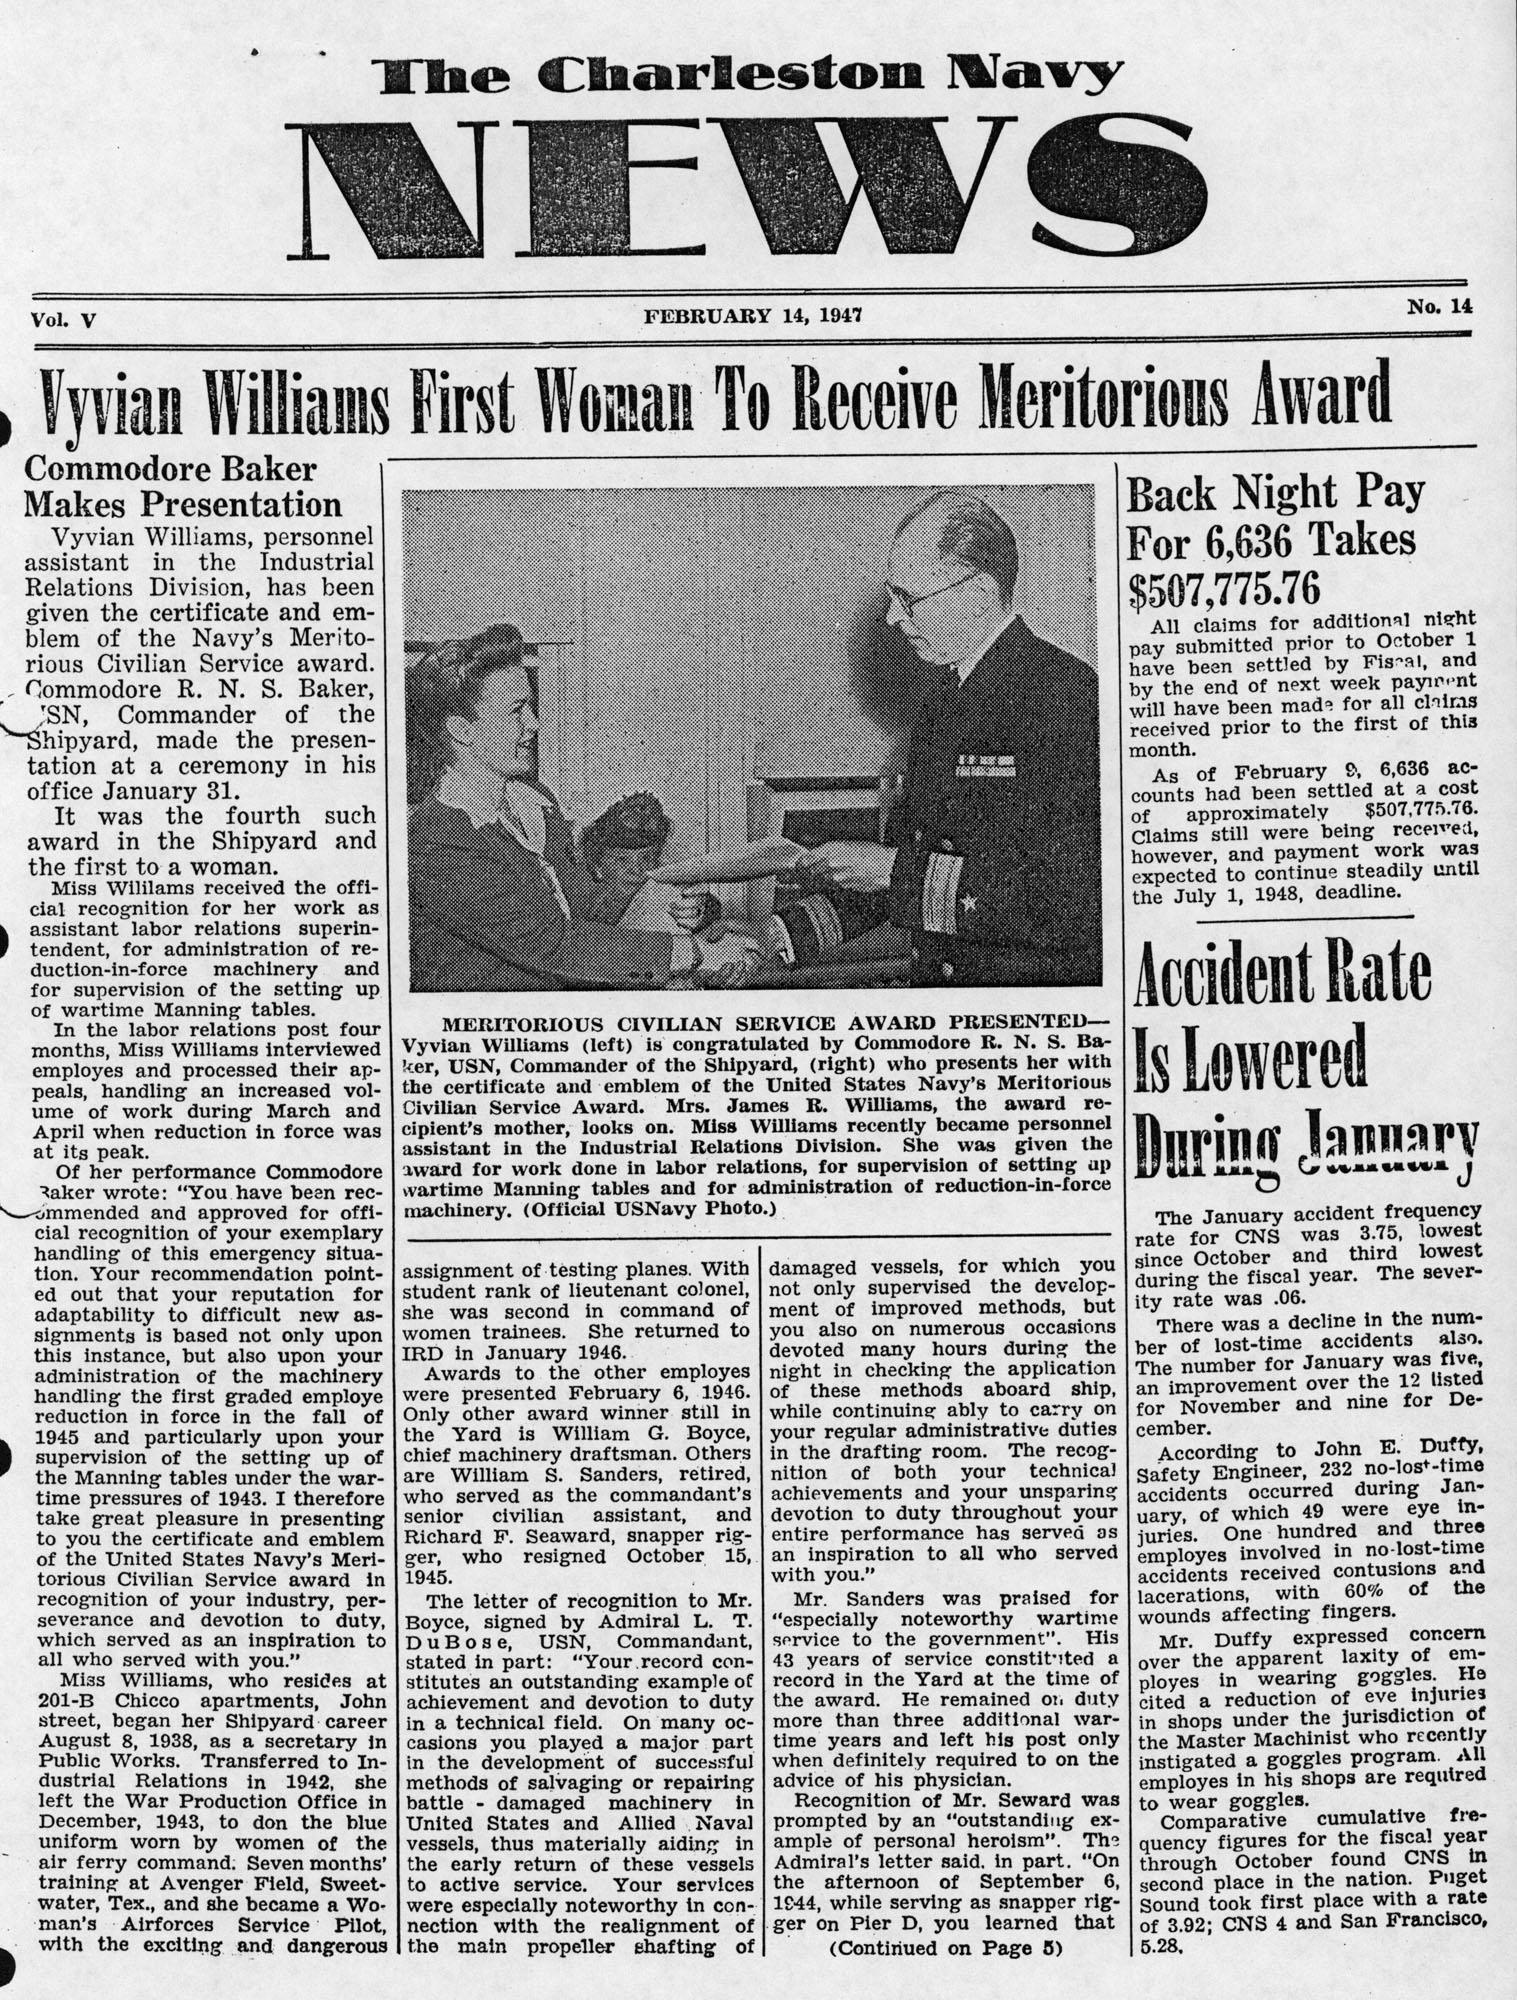 The Charleston Navy News, Volume 5, Edition 14, page i